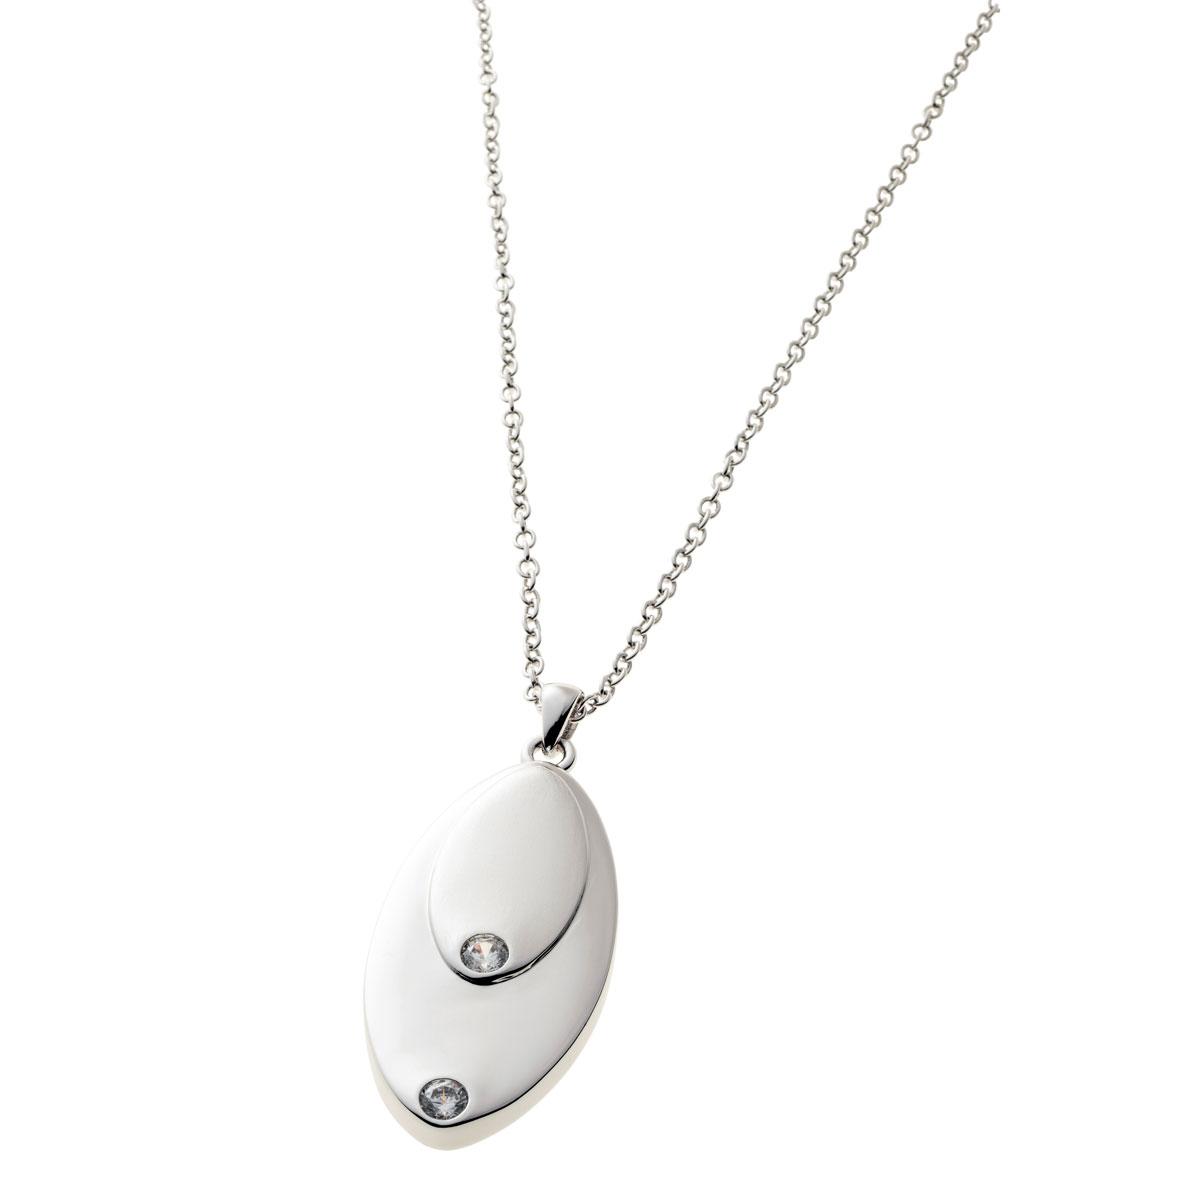 Belleek Living Jewelry Droplet Necklace